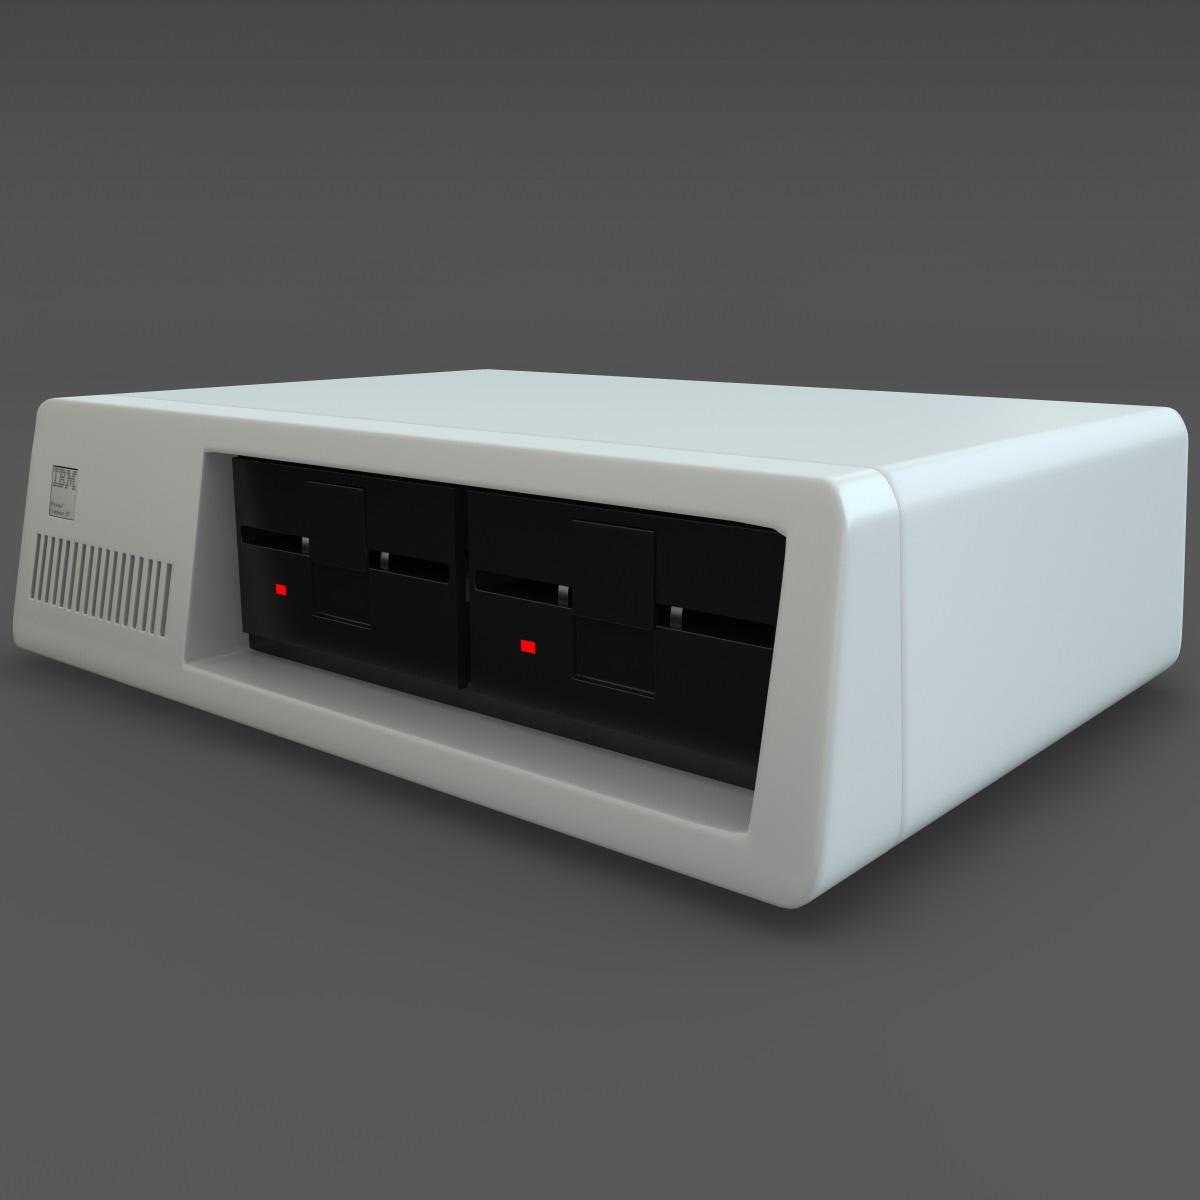 147696_IBM_PC_XT_010.jpg